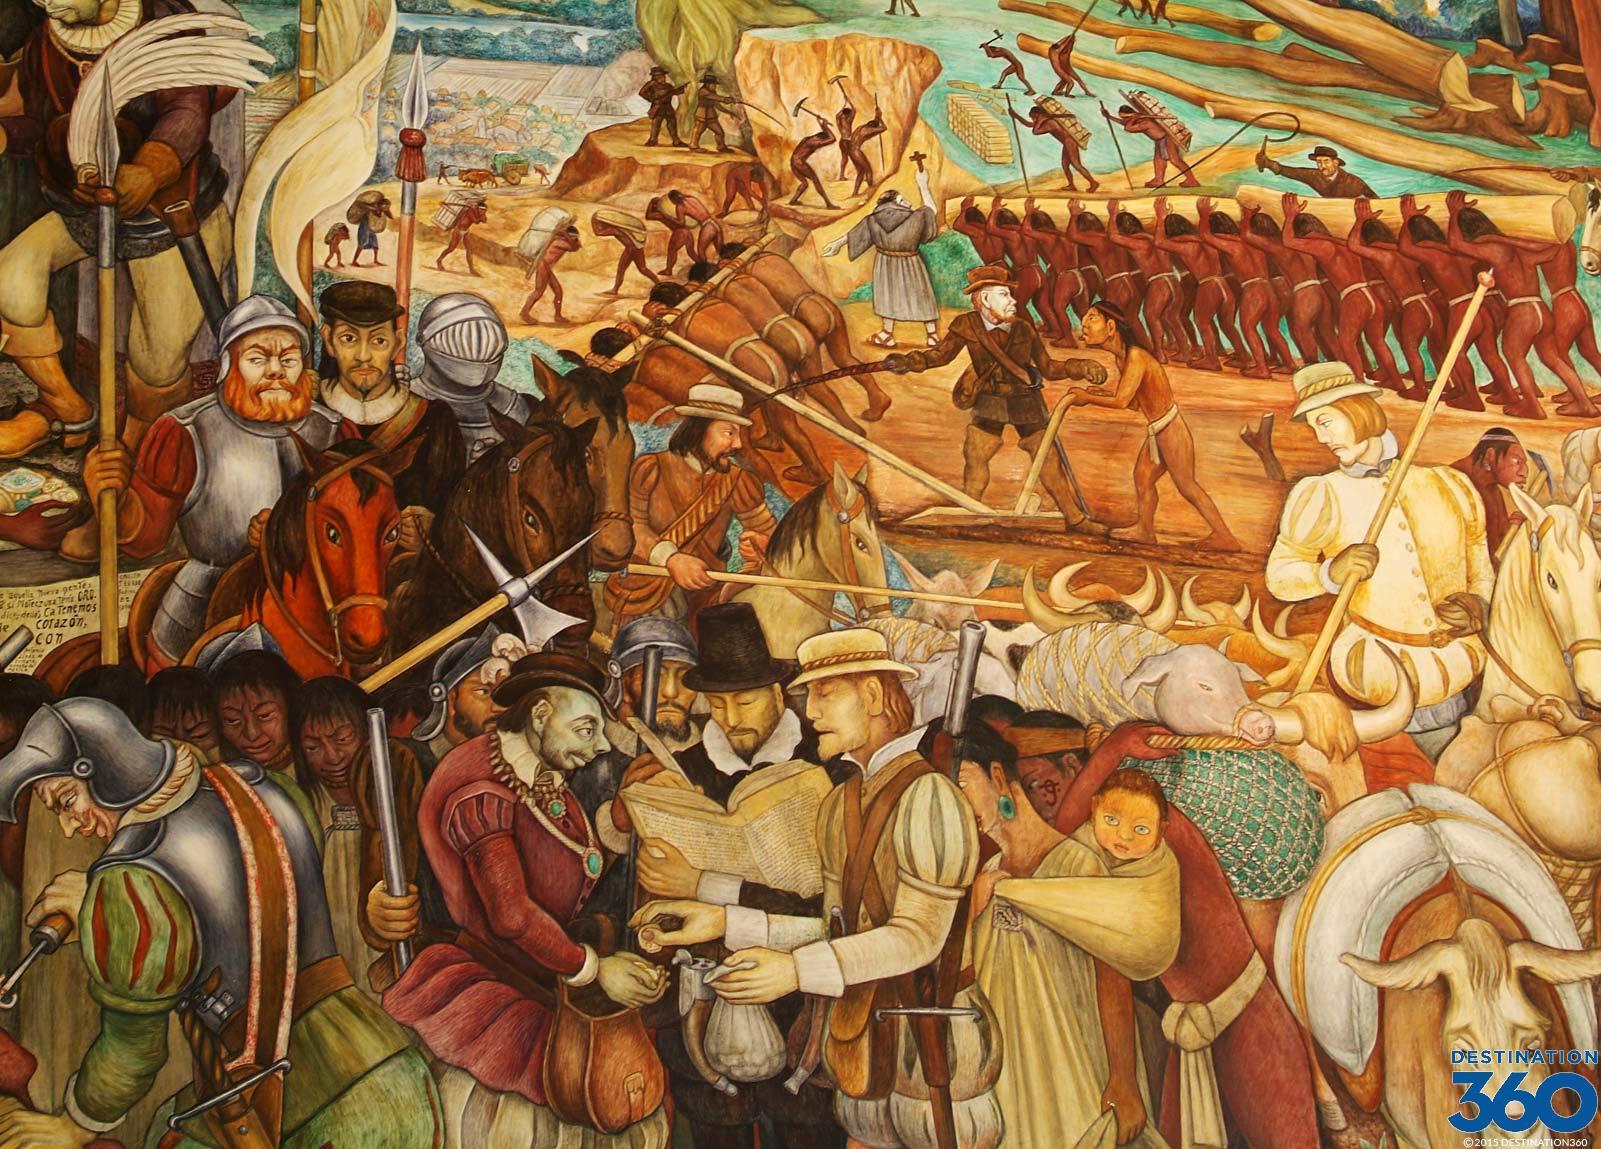 Diego-rivera-mural-